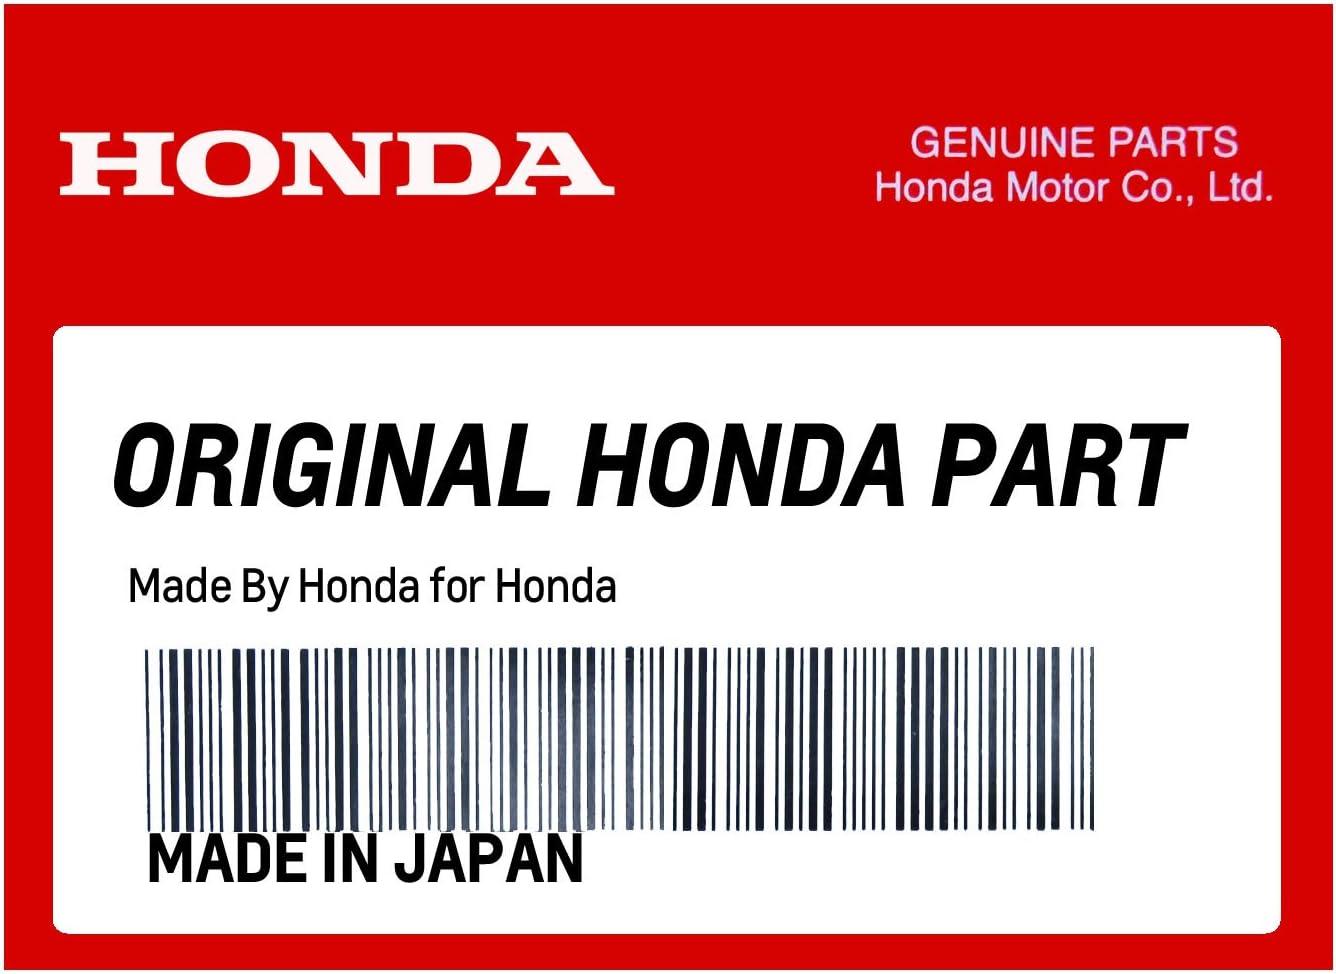 HONDA Brand new 45108-300-003 PISTON online shop SEAL